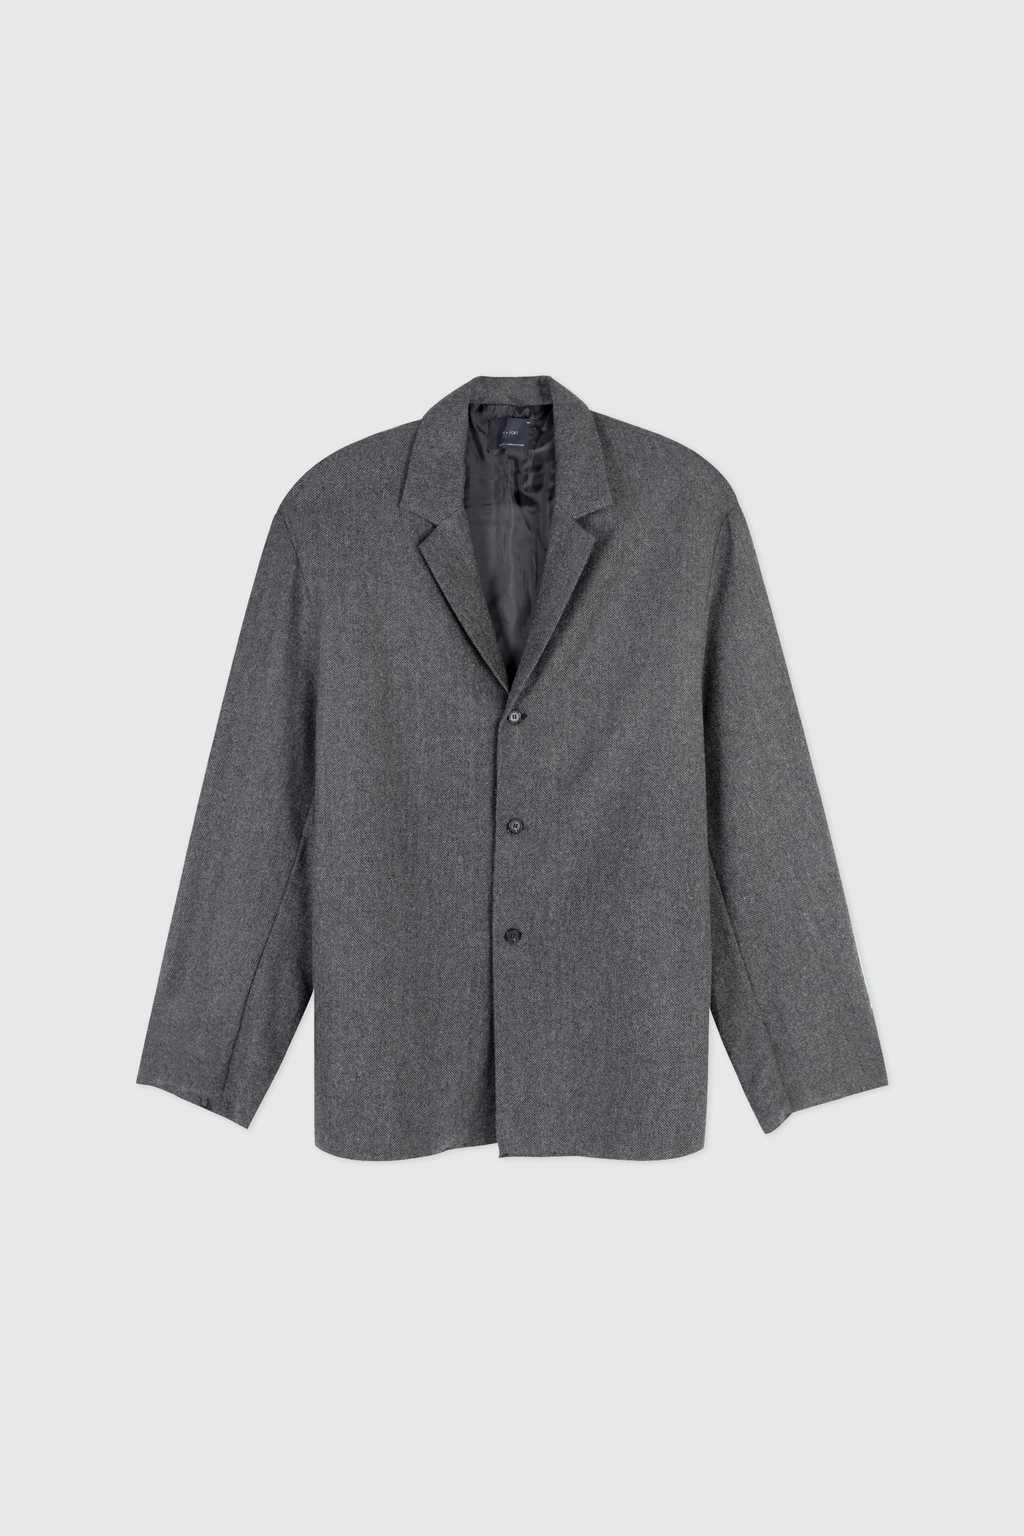 Jacket J002M Gray 4